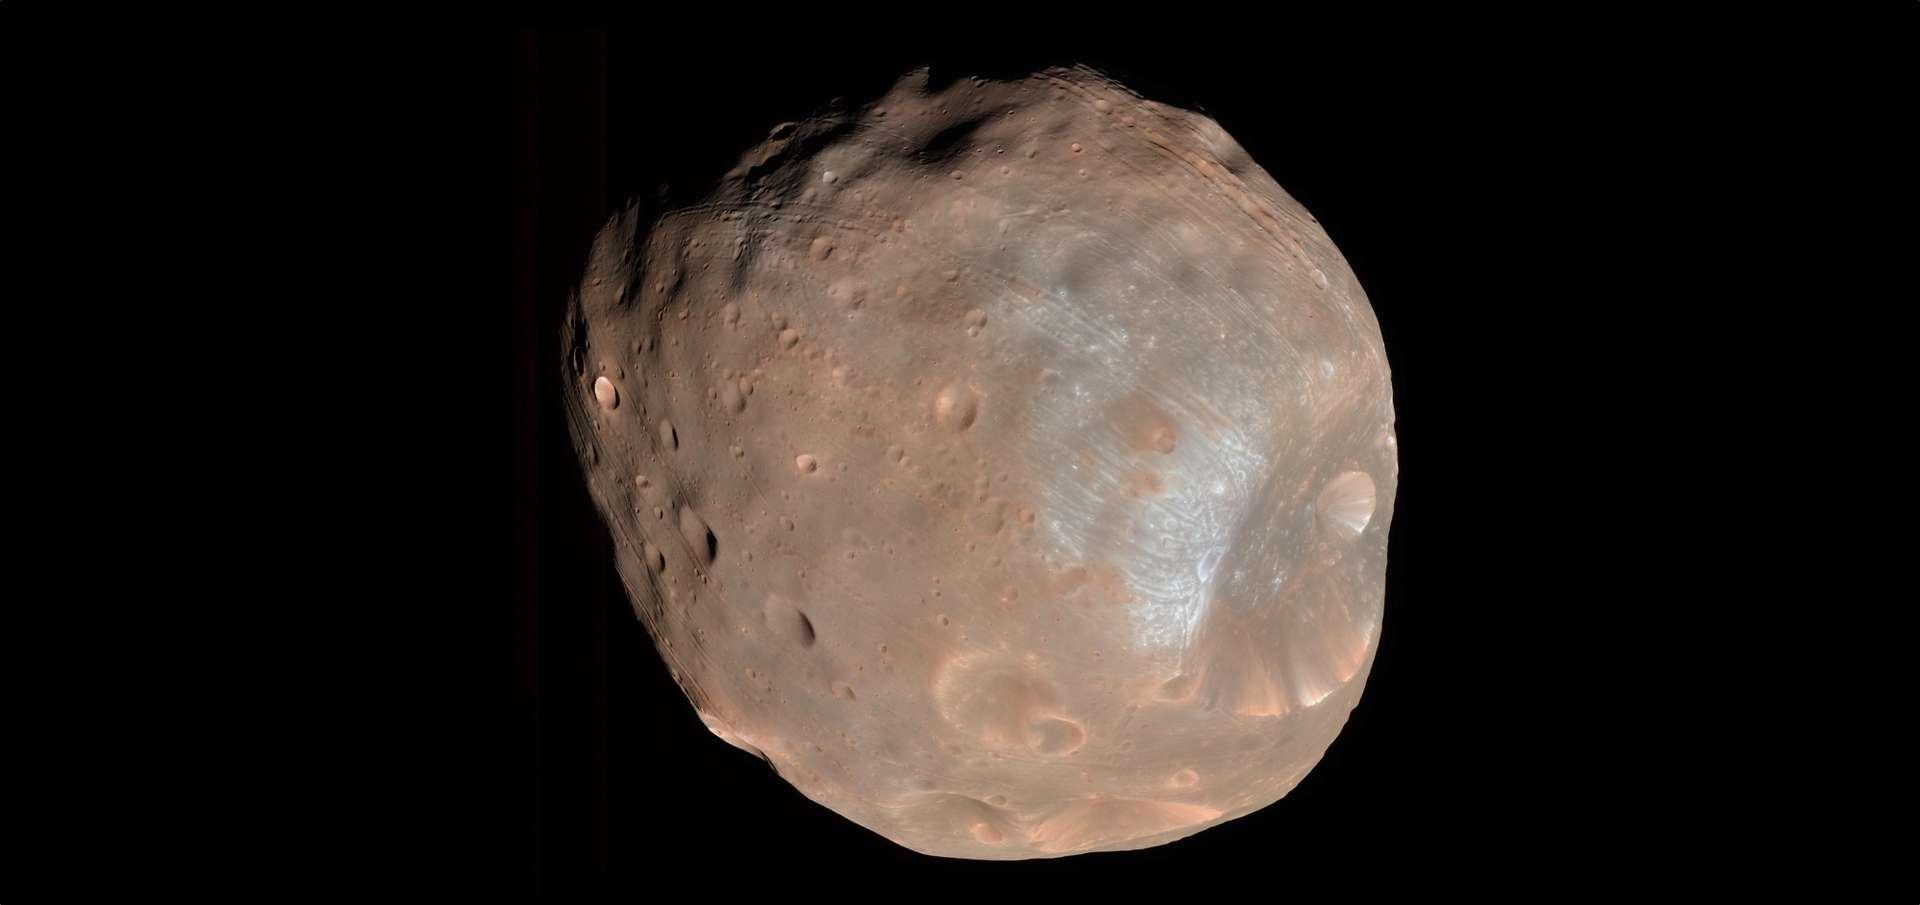 Portrait de Phobos par Mars Express. © ESA